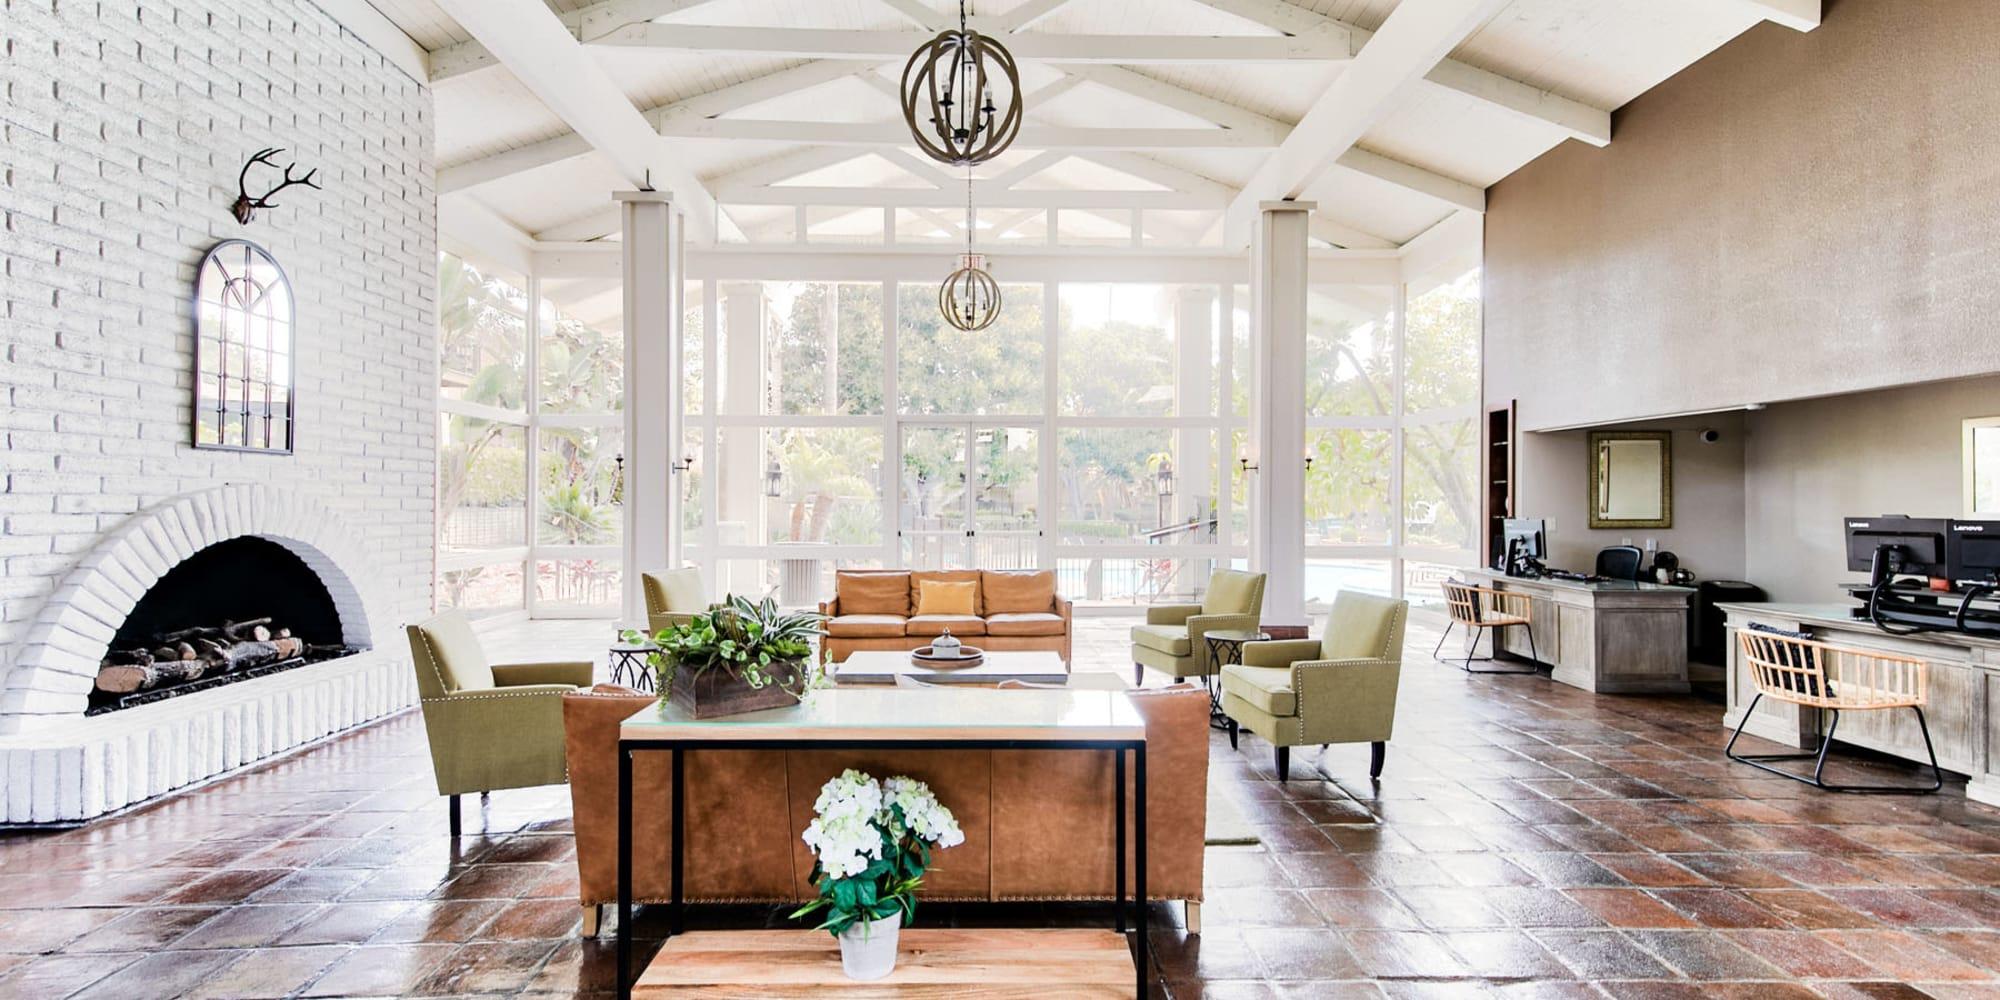 Bright and welcoming lobby interior at Mediterranean Village Apartments in Costa Mesa, California